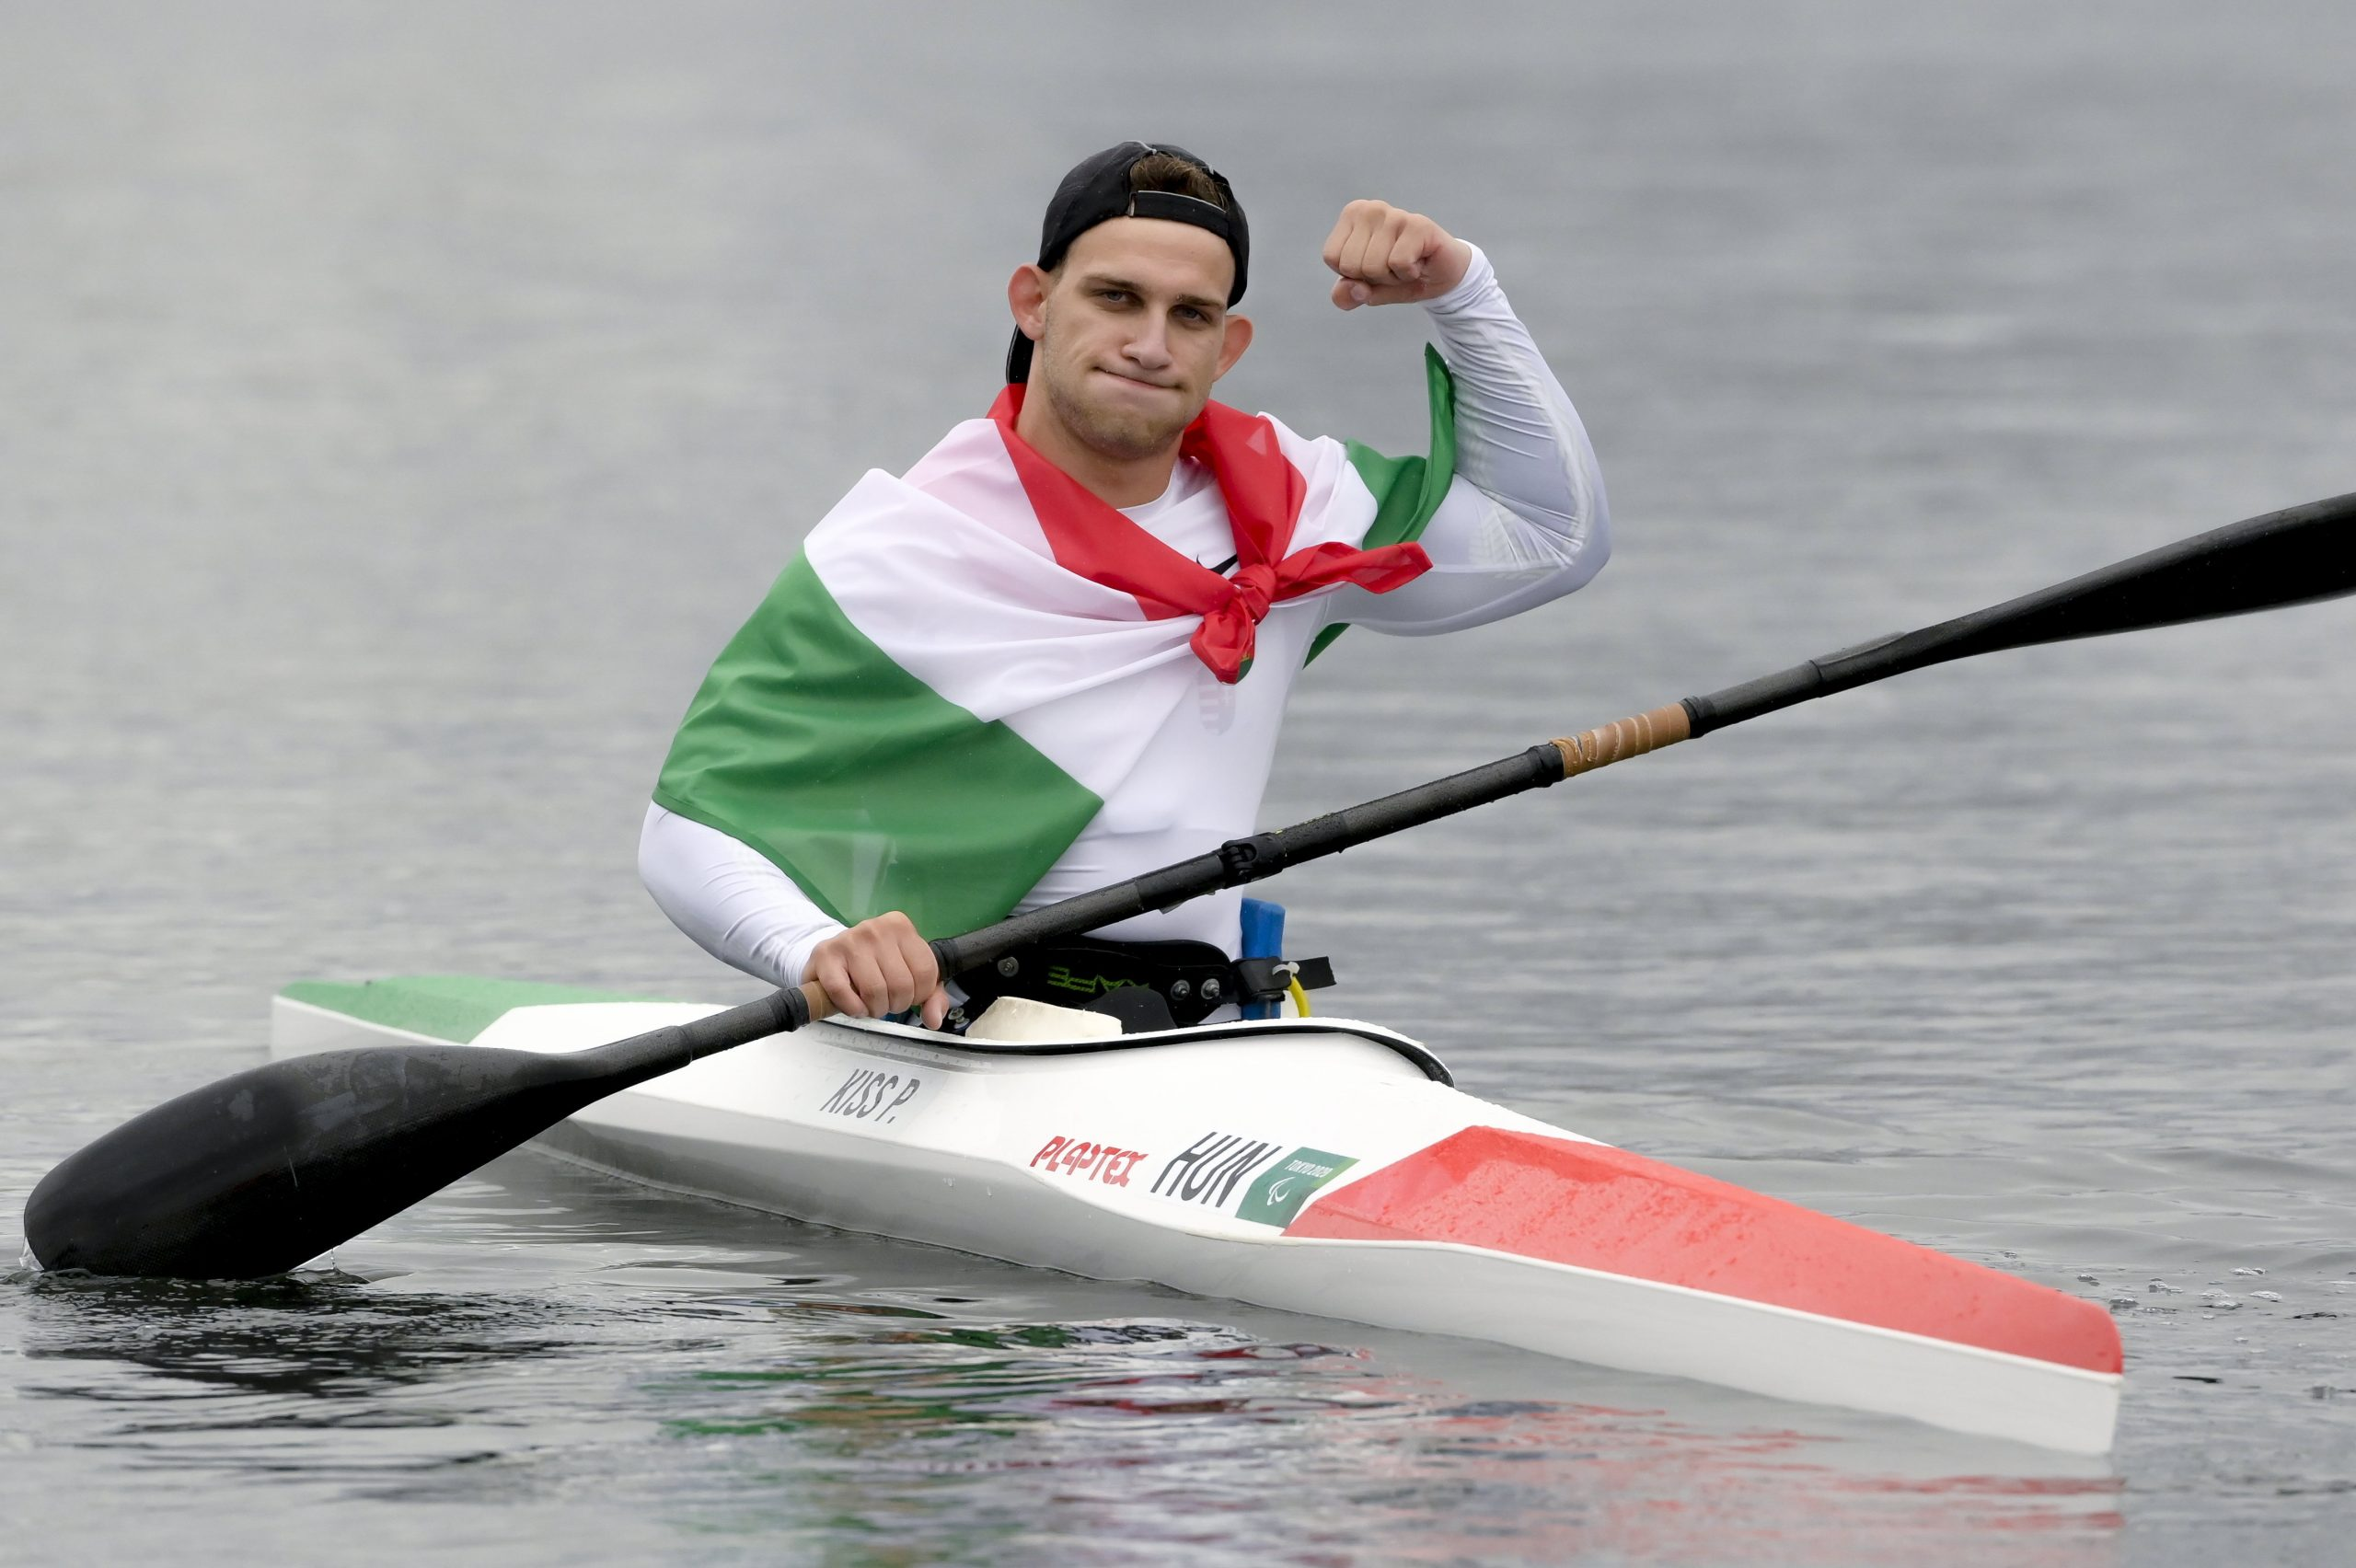 Péter Pál Kiss holt unsere siebte Goldmedaille bei den Paralympics!